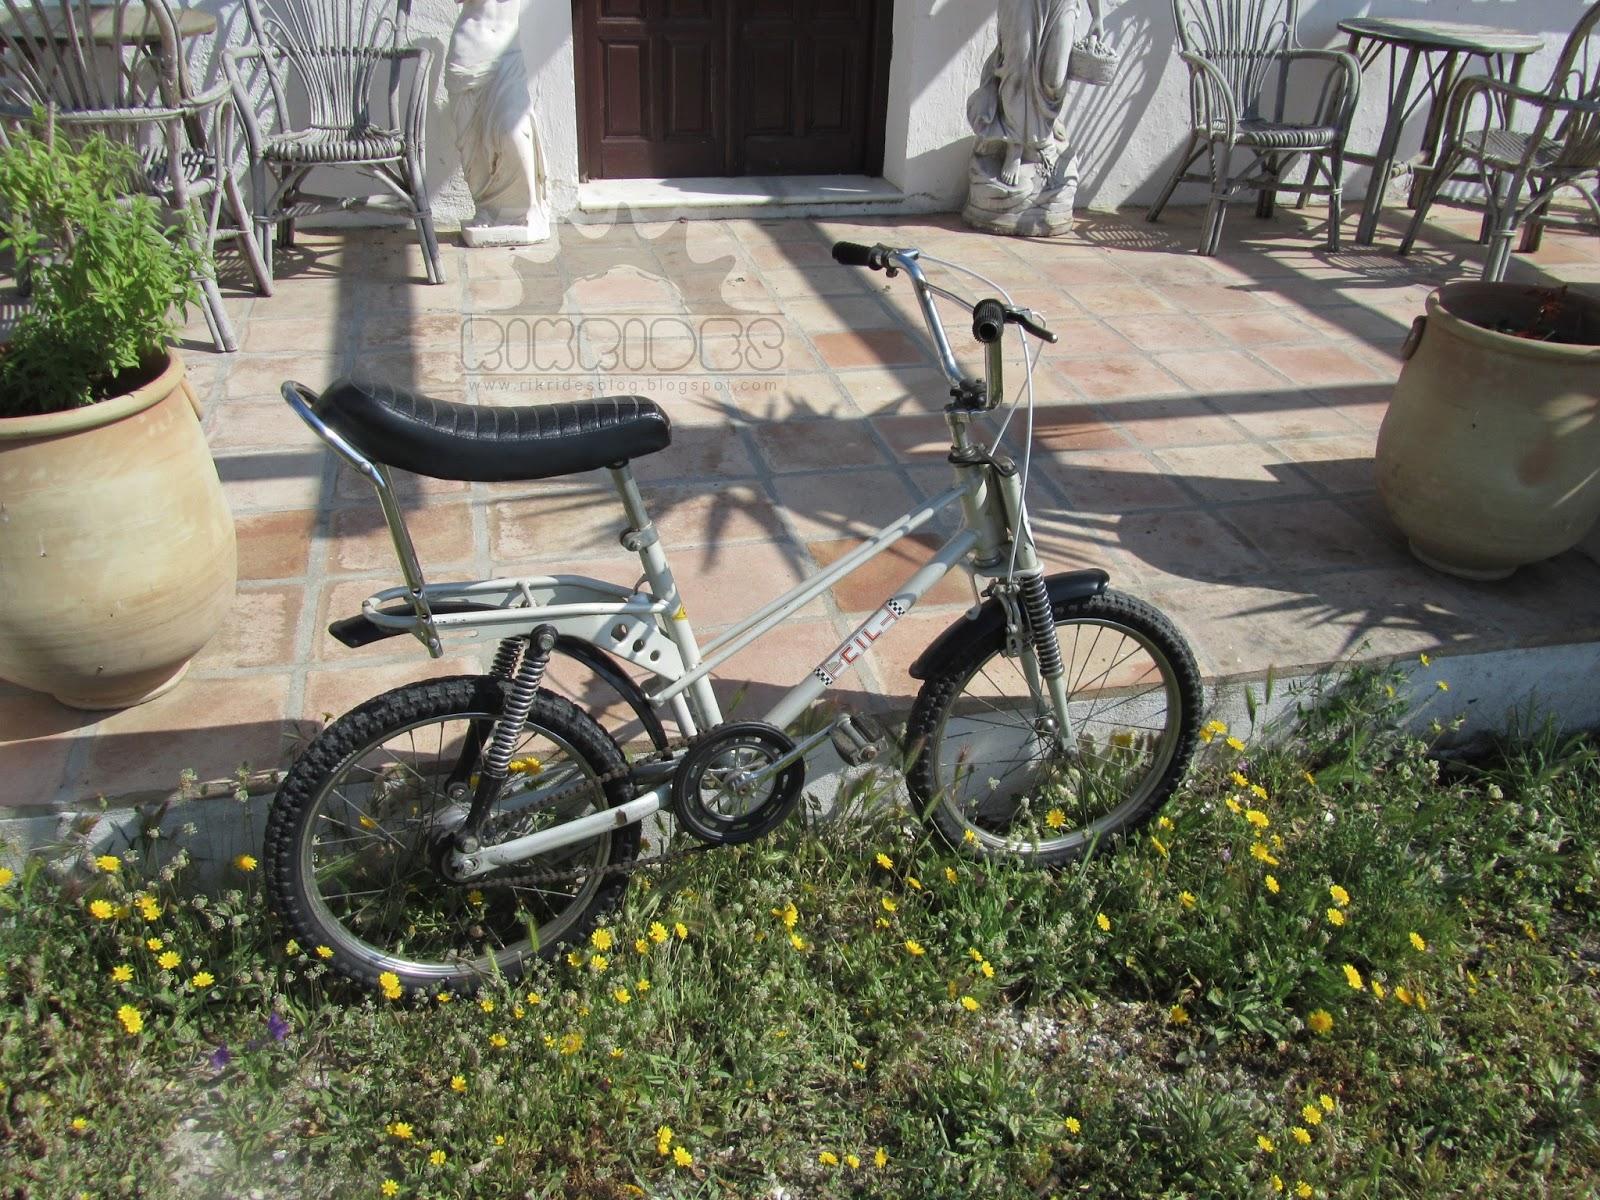 Bicicleta antigua - Bmx Super Cil terminada